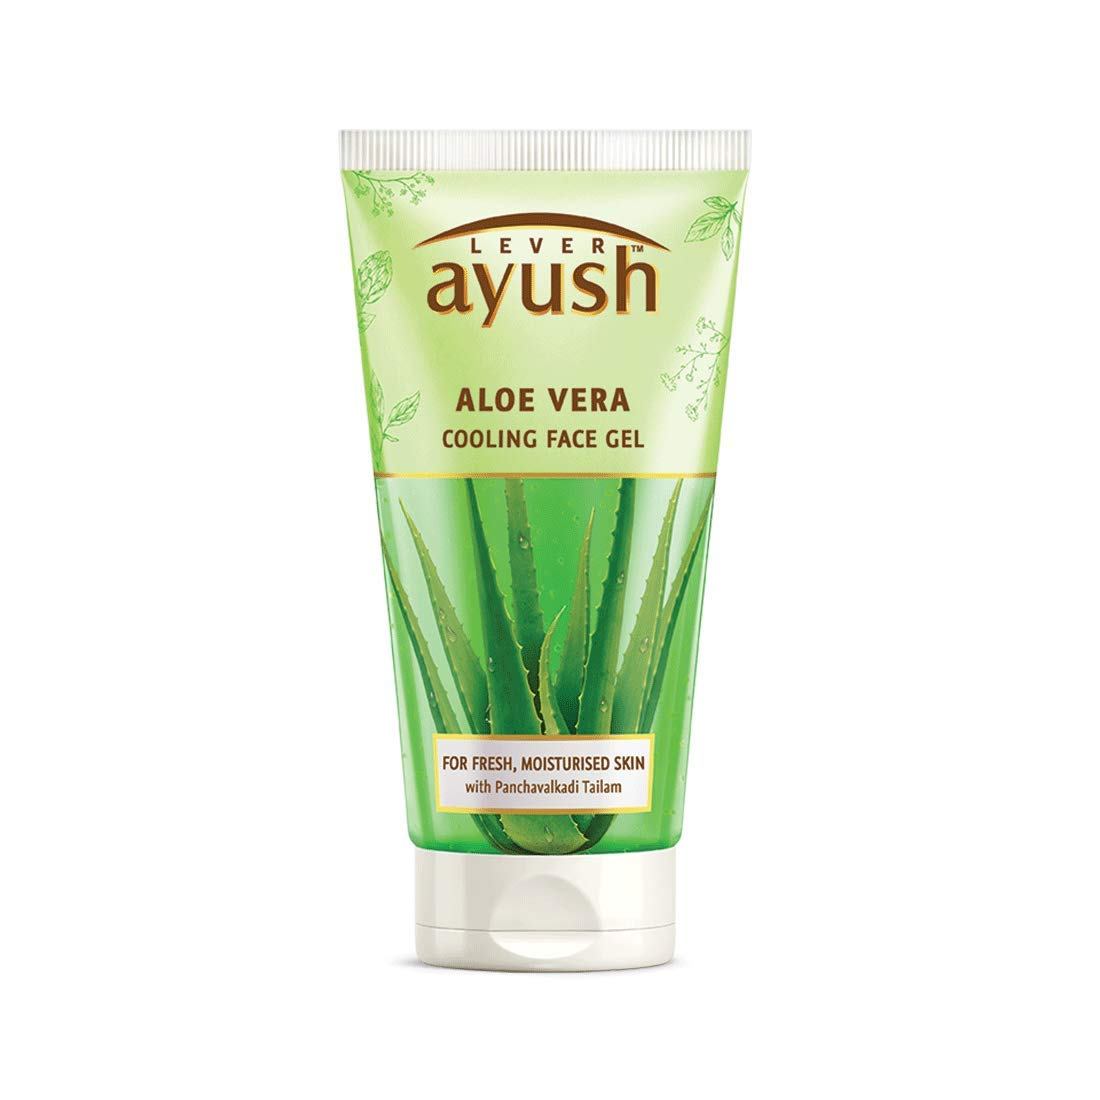 Lever Ayush Aloe Vera Cooling Face Gel